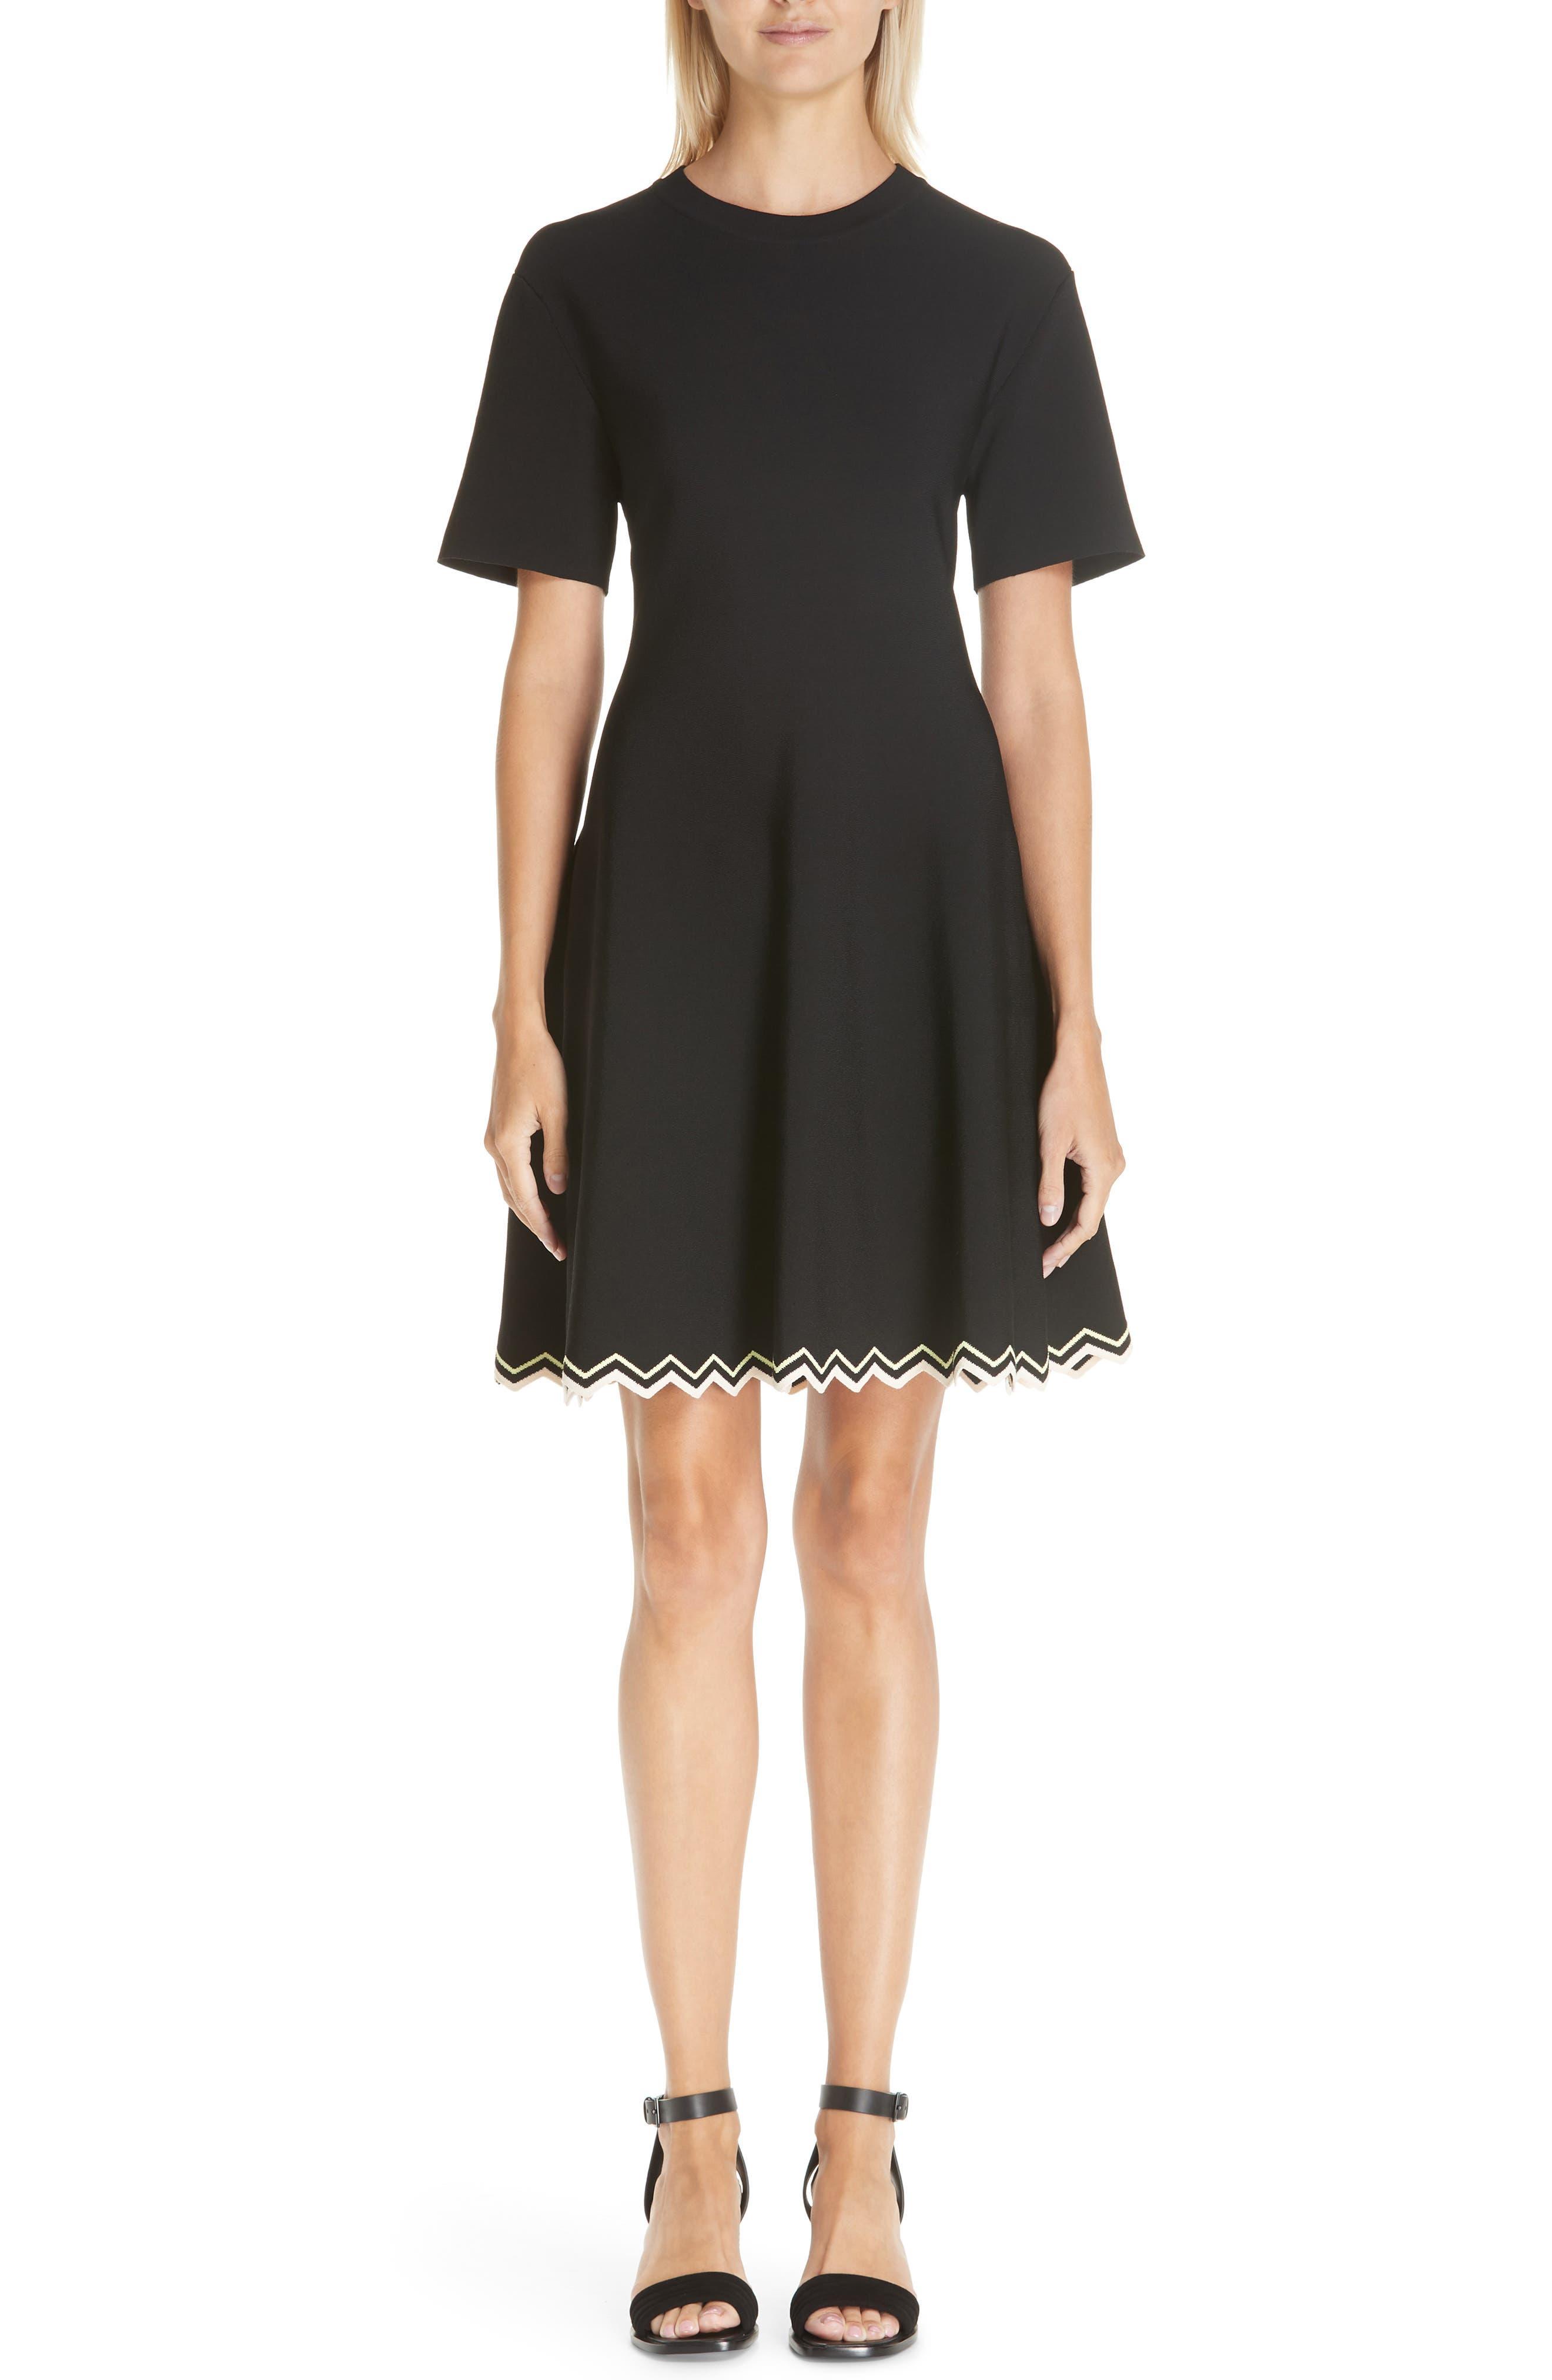 Chevron Hem A-Line Dress, Main, color, 10225 BLACK COMBO